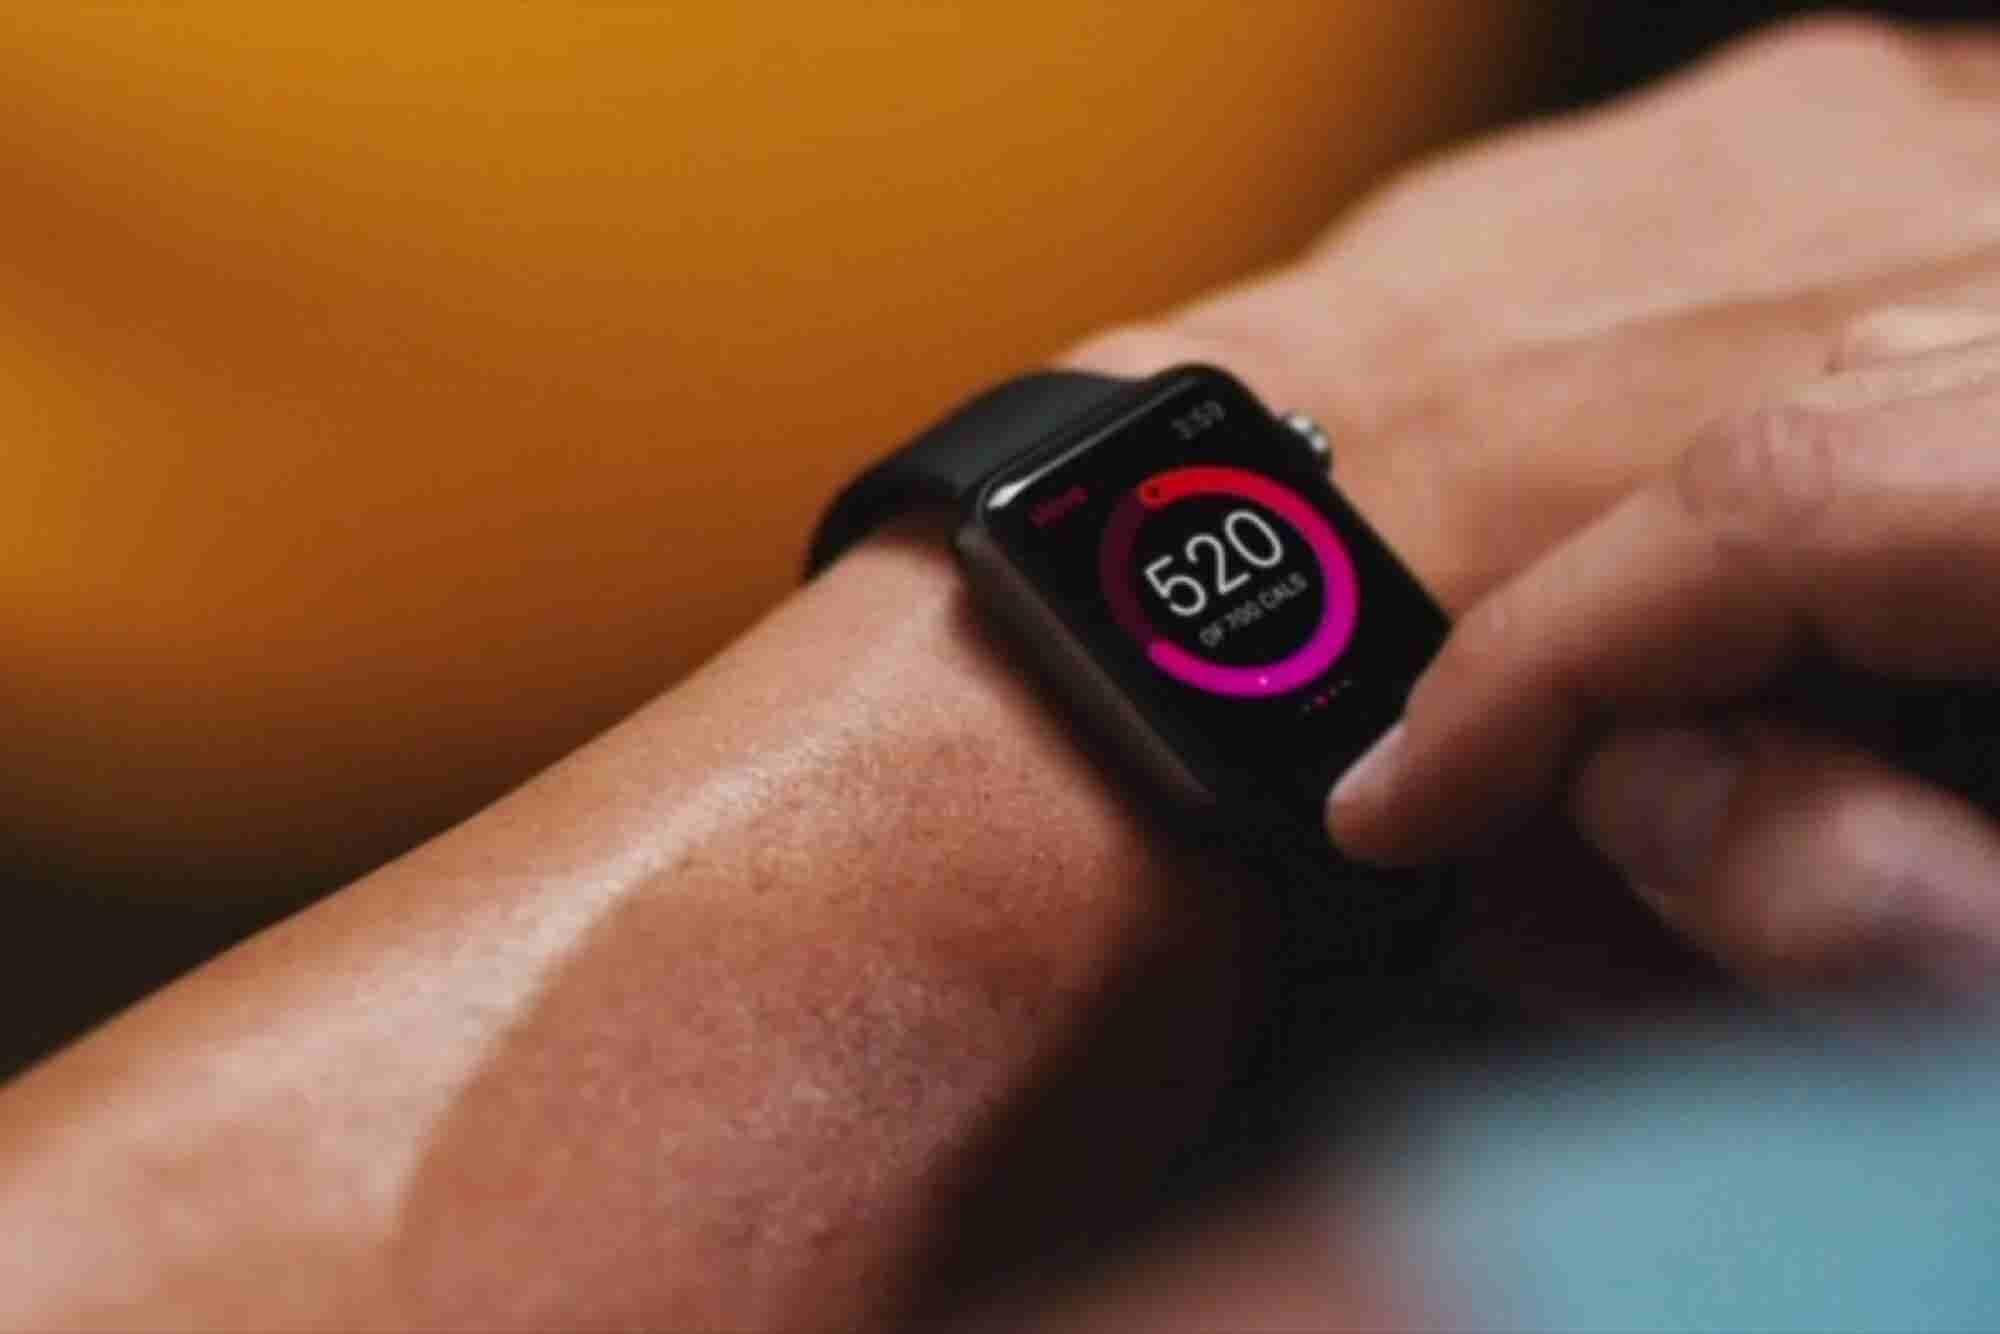 Netflix Invents Apple Watch Alternative in Hilarious New Parody (VIDEO)